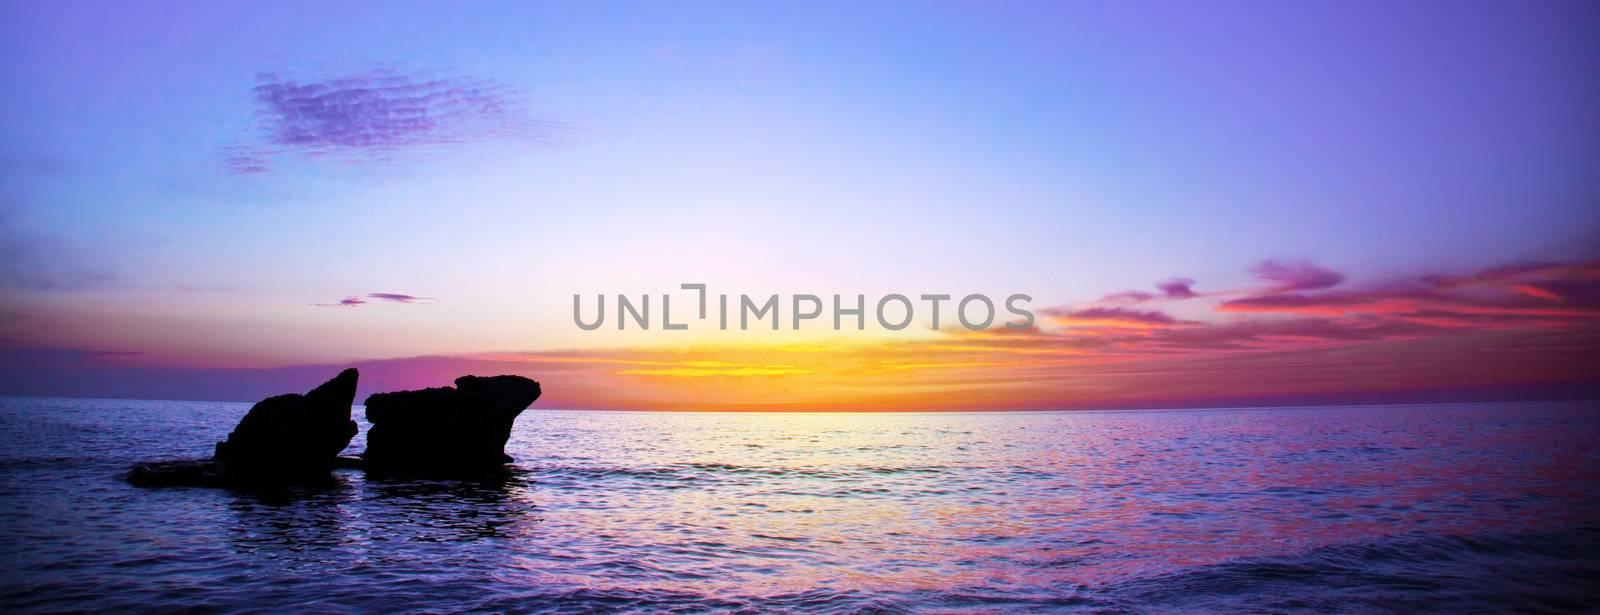 Picture of romantic purple sunset over seascape, peaceful ocean landscape, beautiful rocks in evening sea, calm autumn weather, violet dusk on coastline, night scenery of mediterranean sea, travel concept